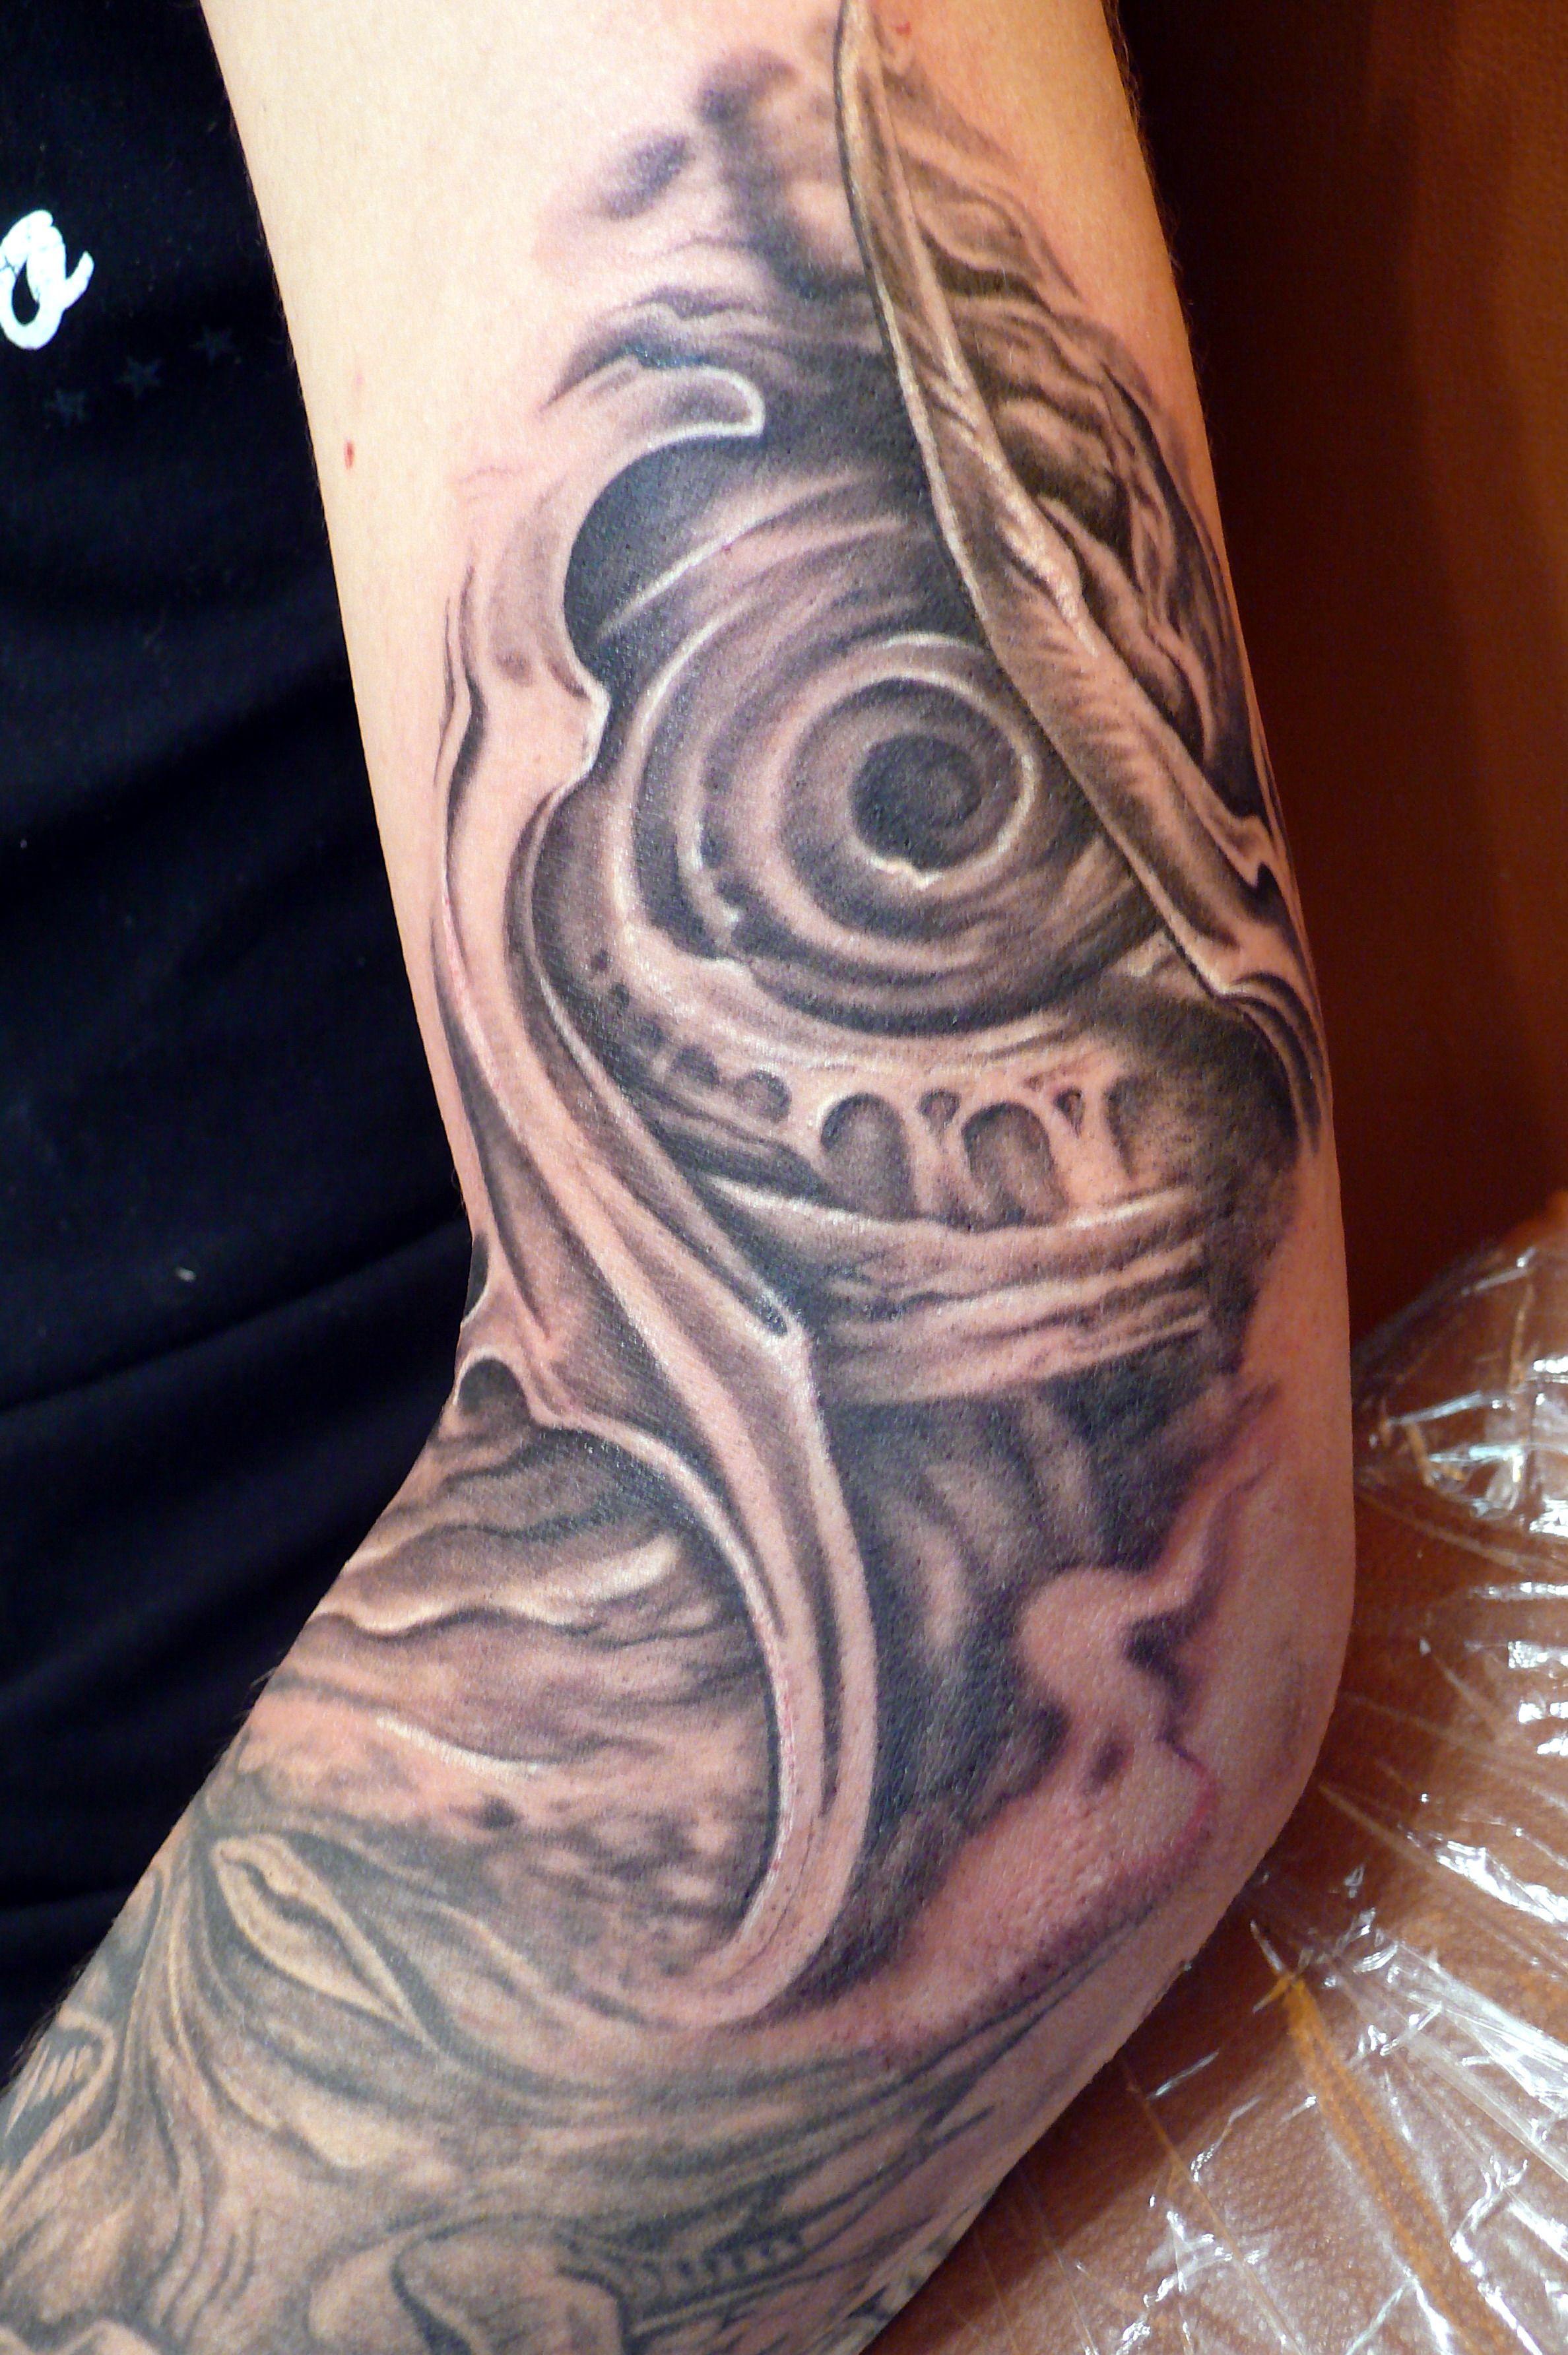 Hr giger tattoo designs - Grey Ink Biomechanical Alien Tattoo Design For Left Sleeve